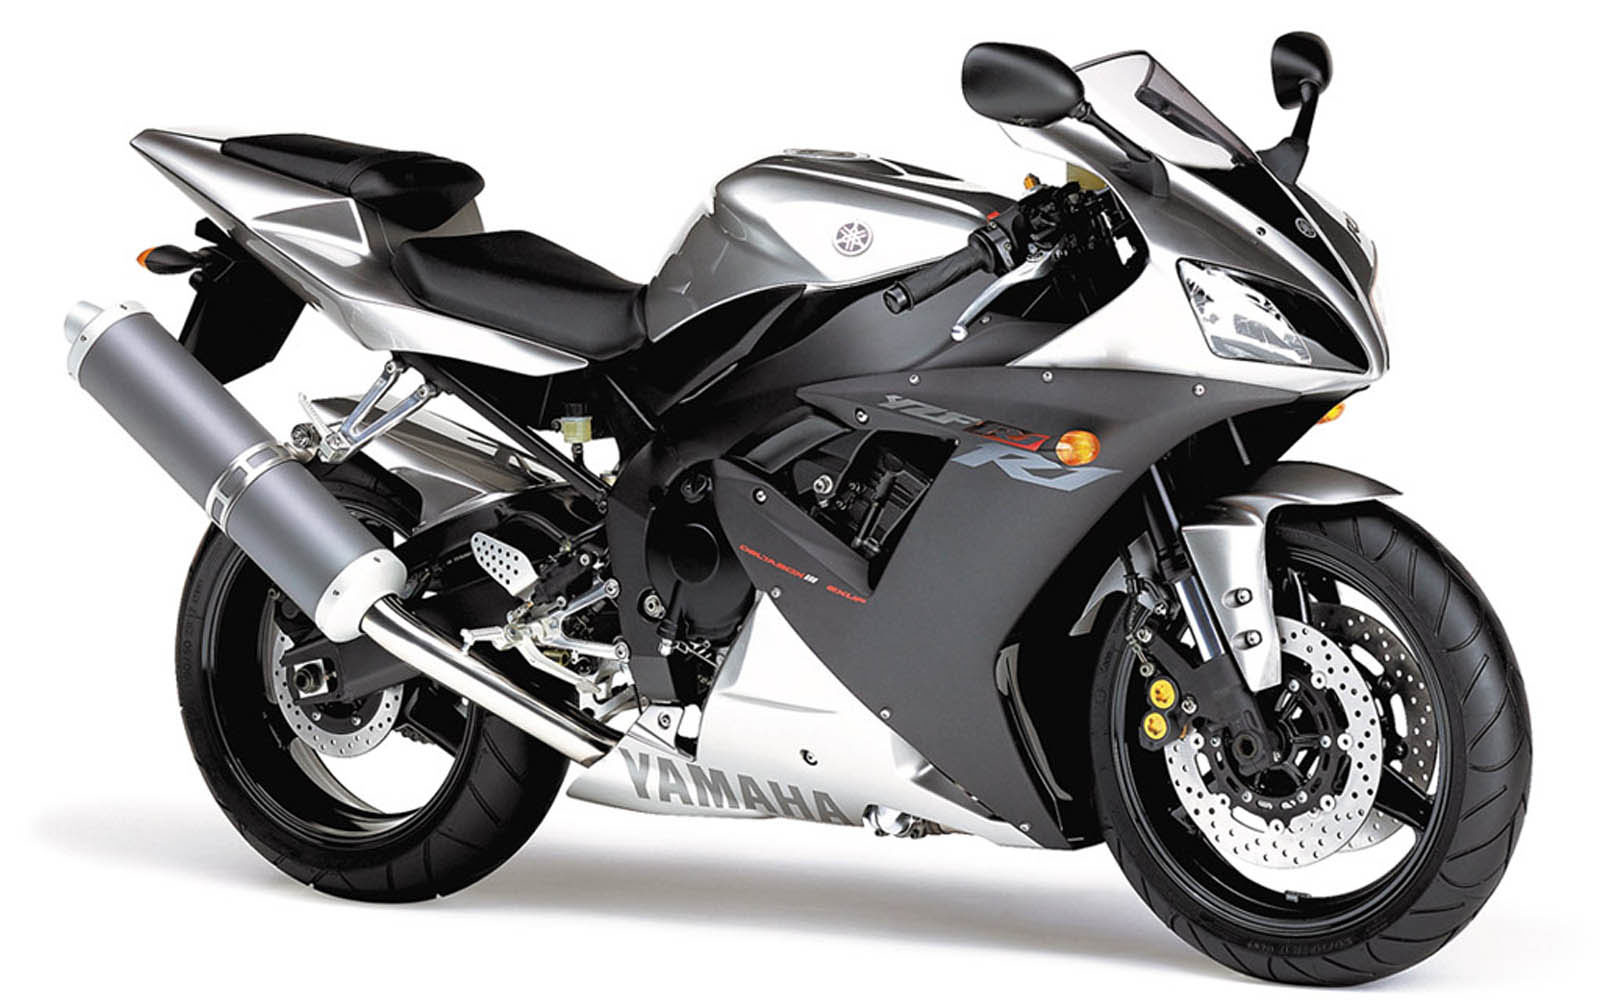 Desktop Wallpapers Yamaha R1 Motorcycle Desktop Wallpapers 1600x1000